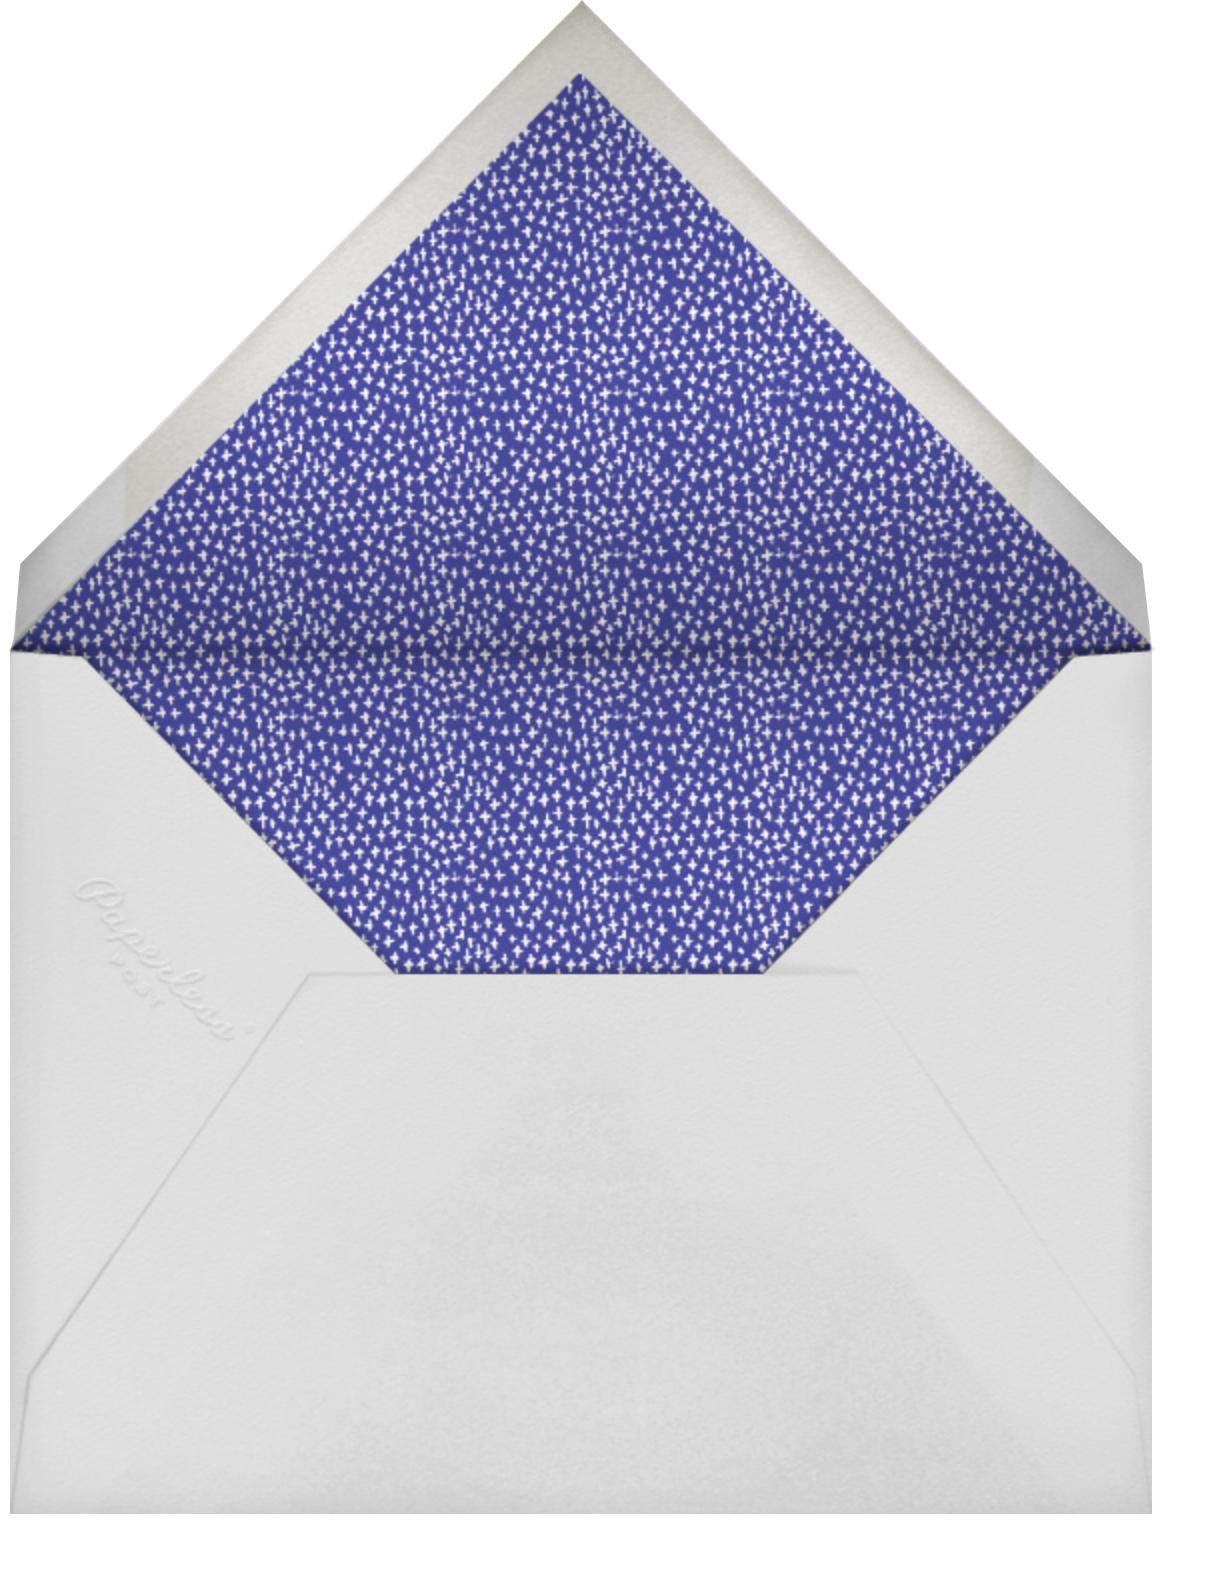 Ready to Burst - Bellini/Medium - Mr. Boddington's Studio - Baby shower - envelope back